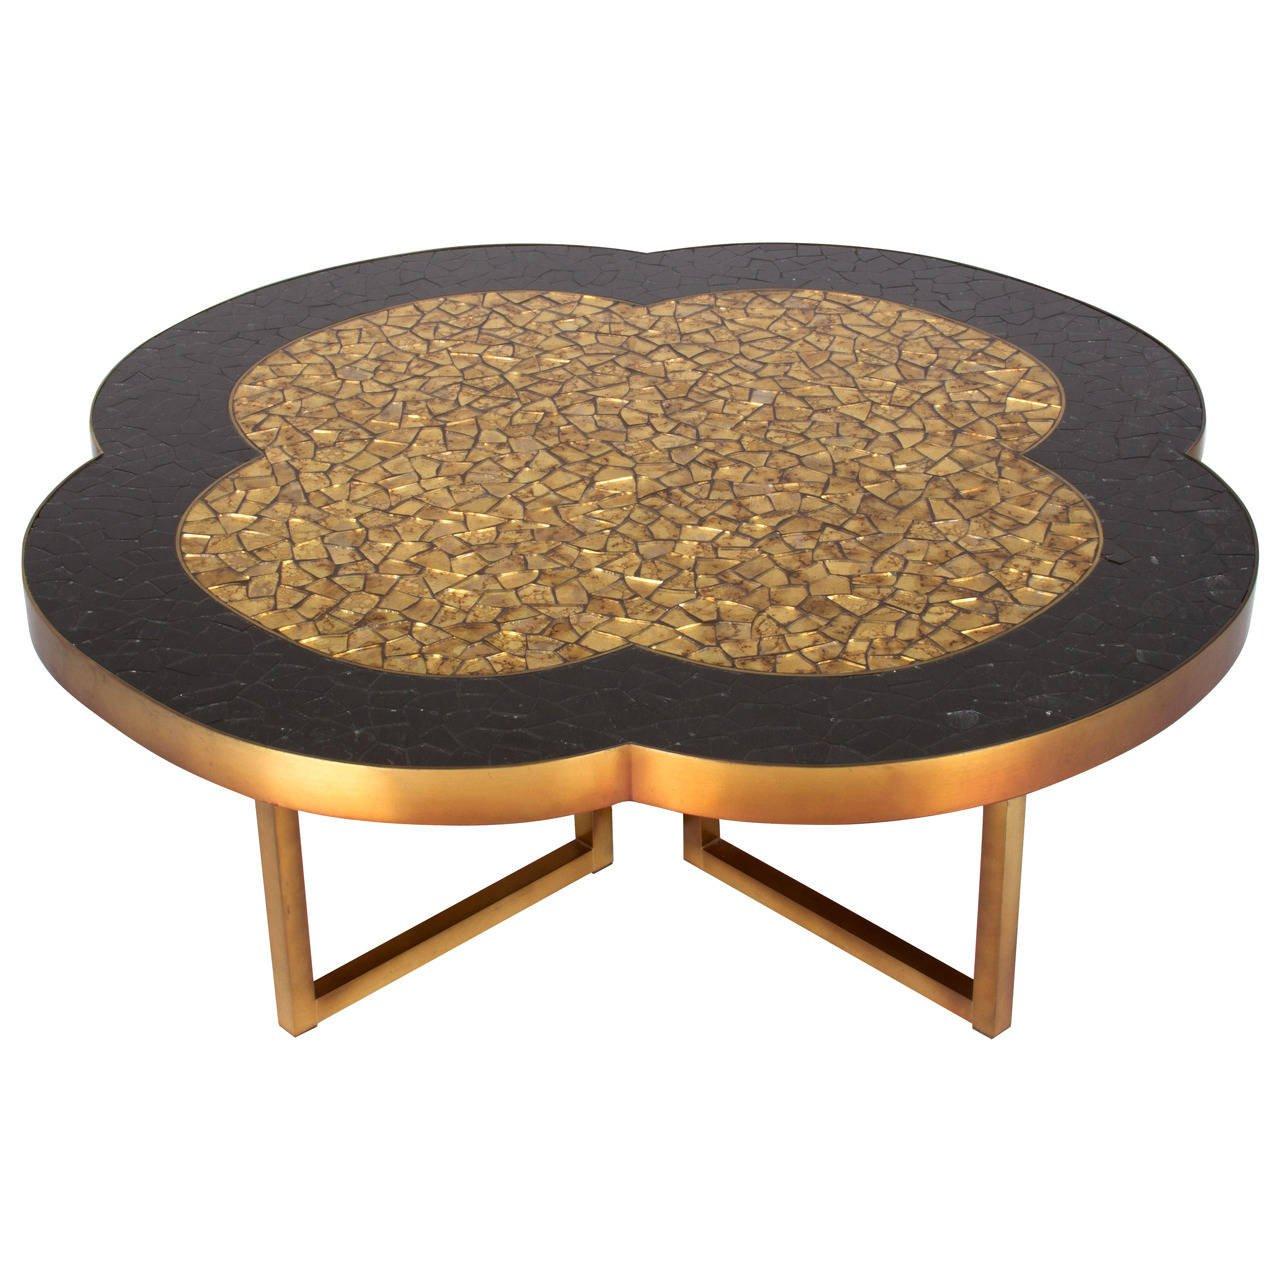 quatrefoil coffee table 11